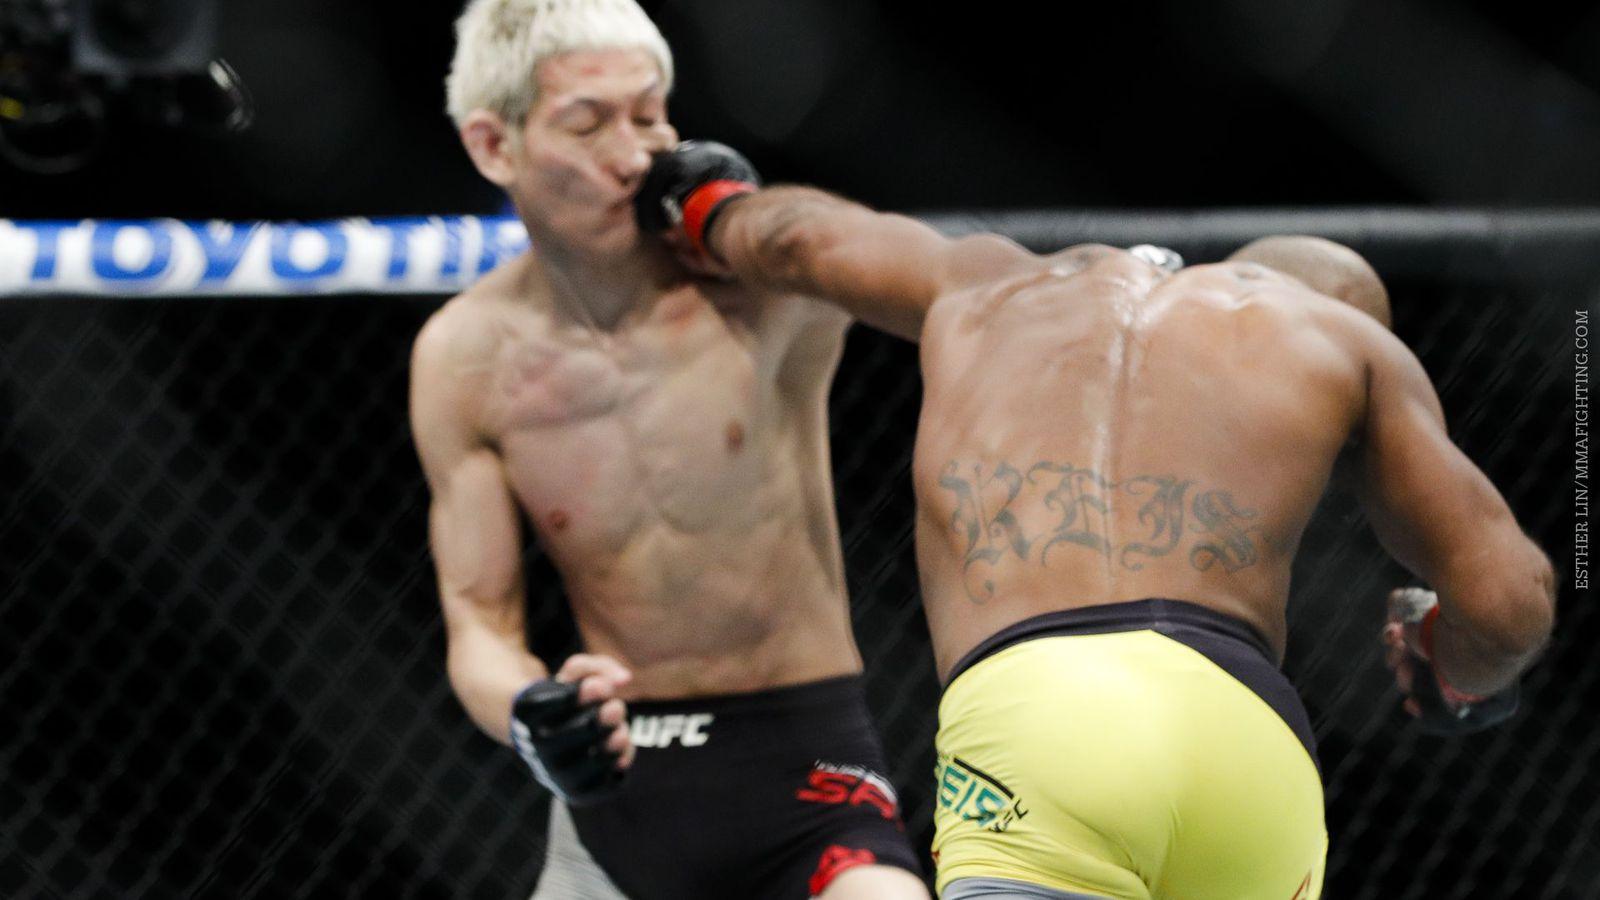 UFC 208 prelims do 874,000 viewers